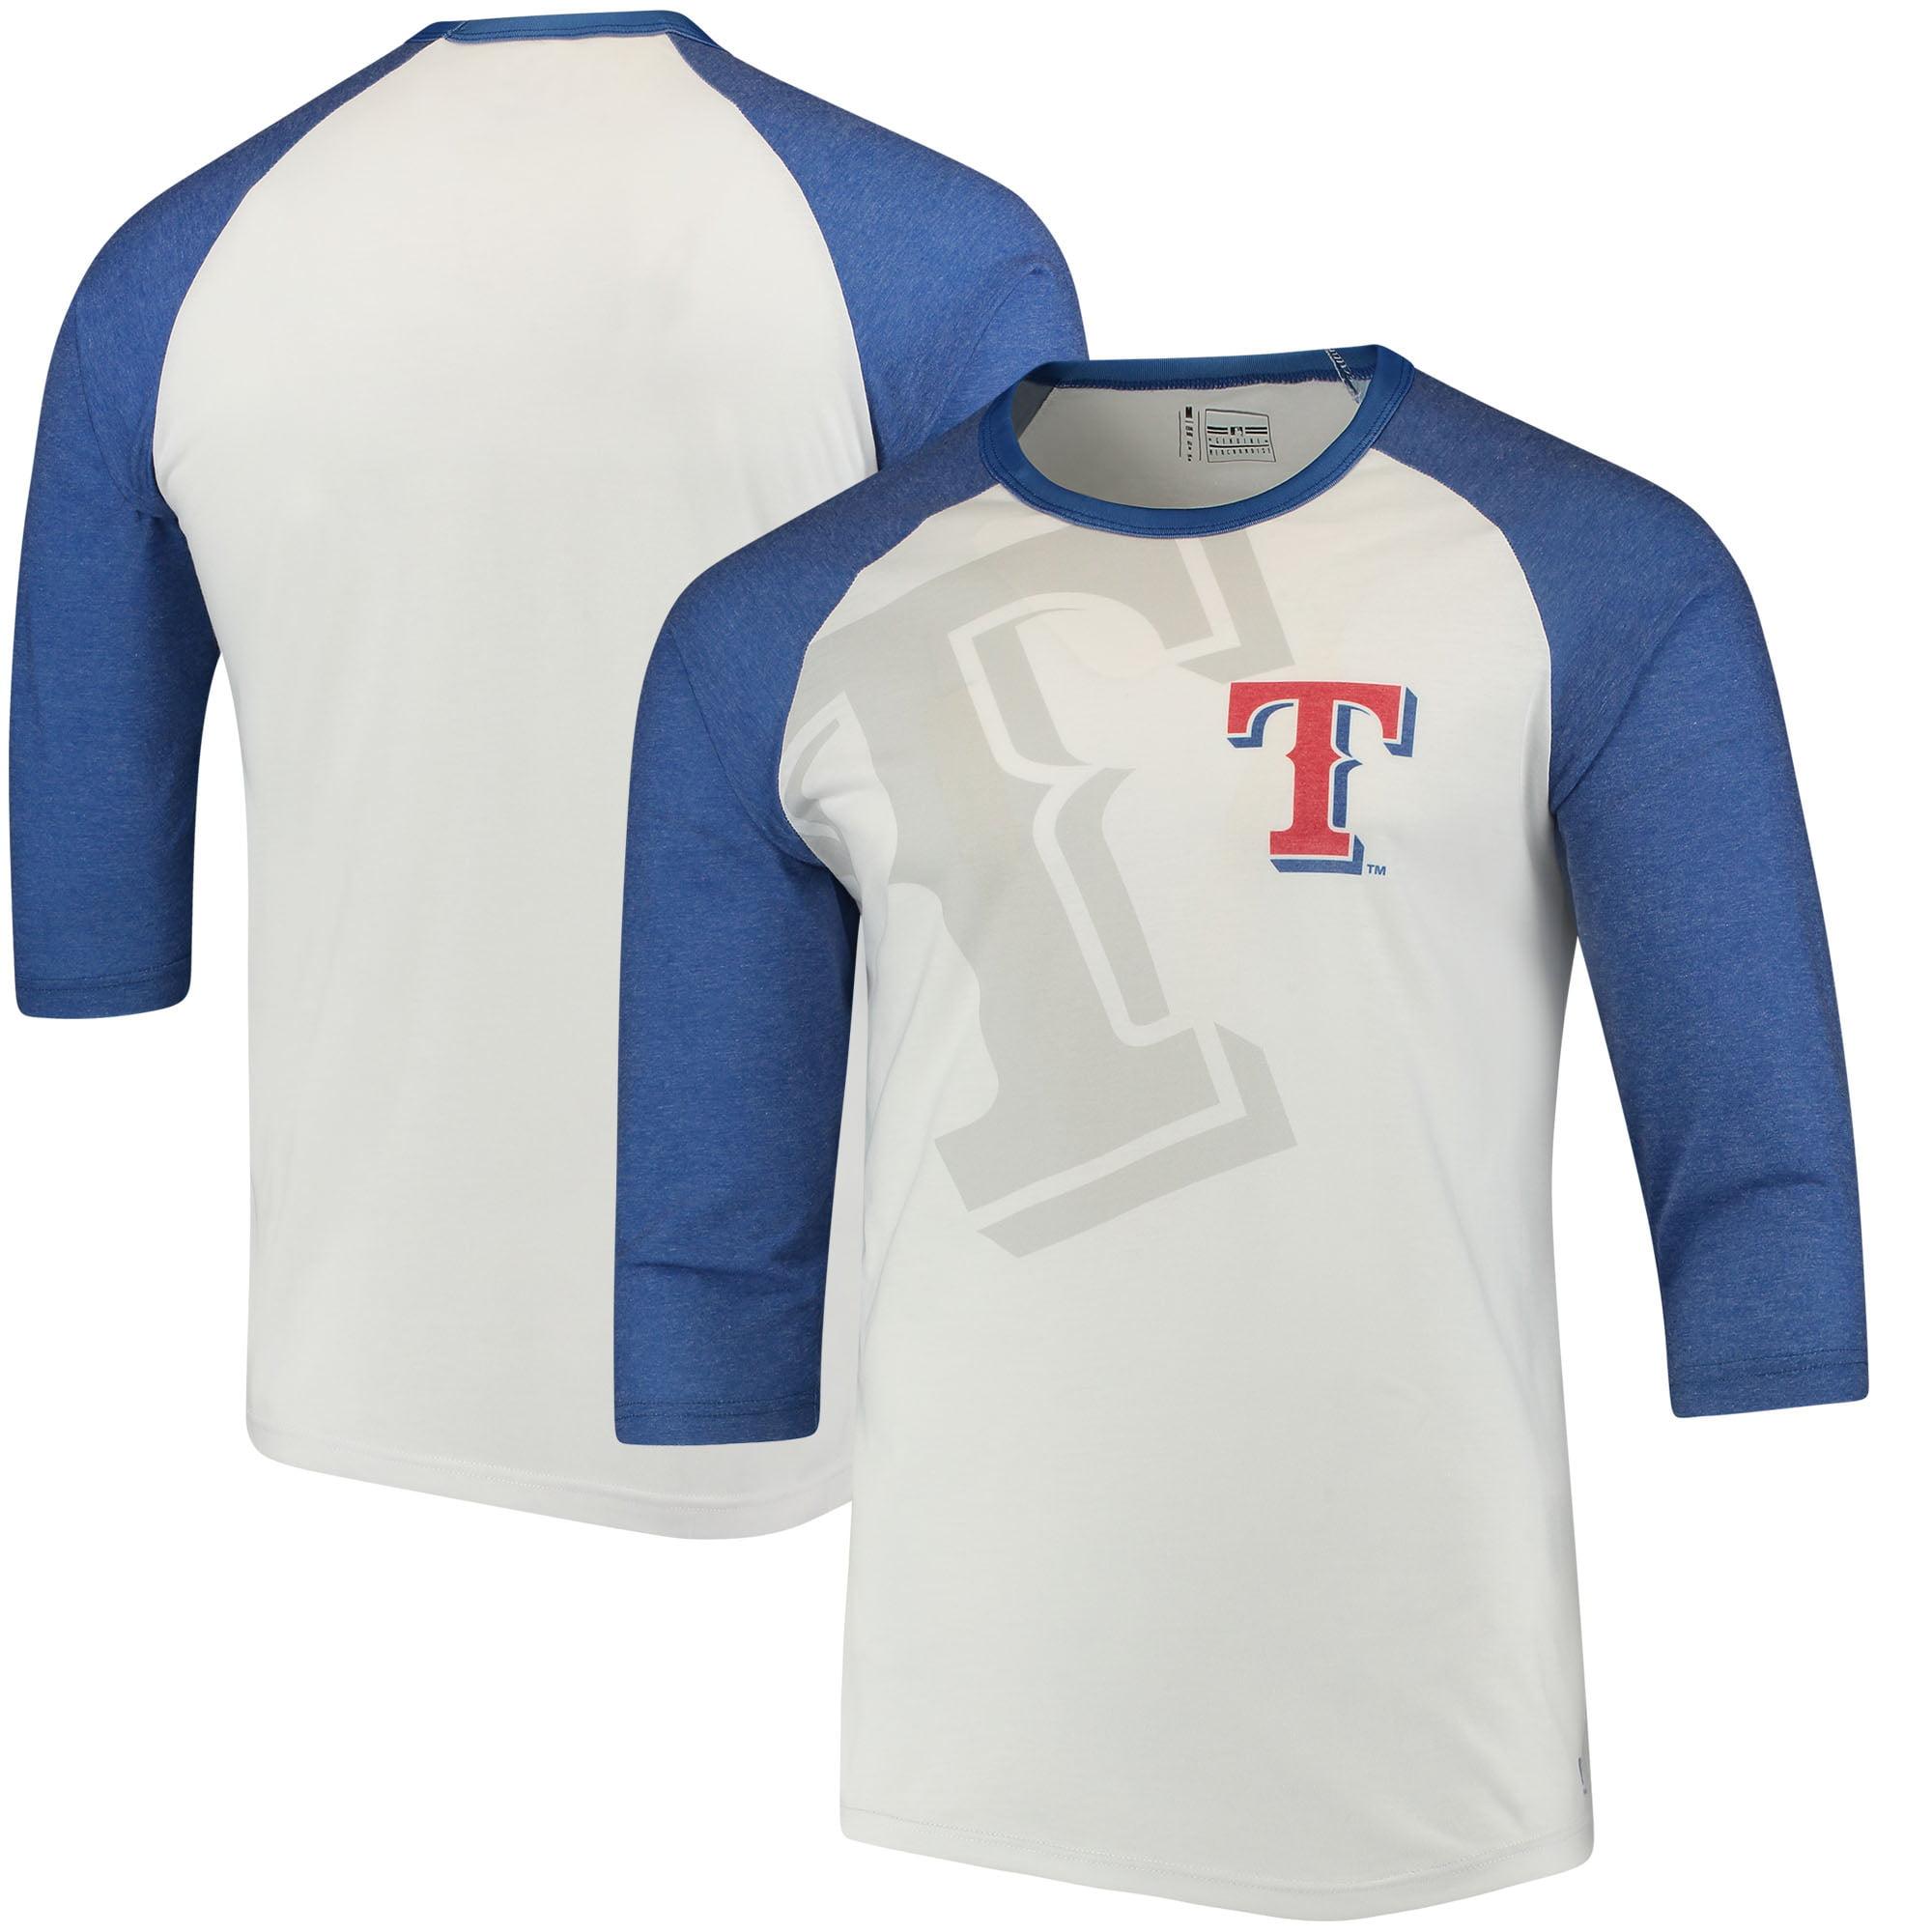 Texas Rangers Baseball 3/4-Sleeve Raglan T-Shirt - White/Royal